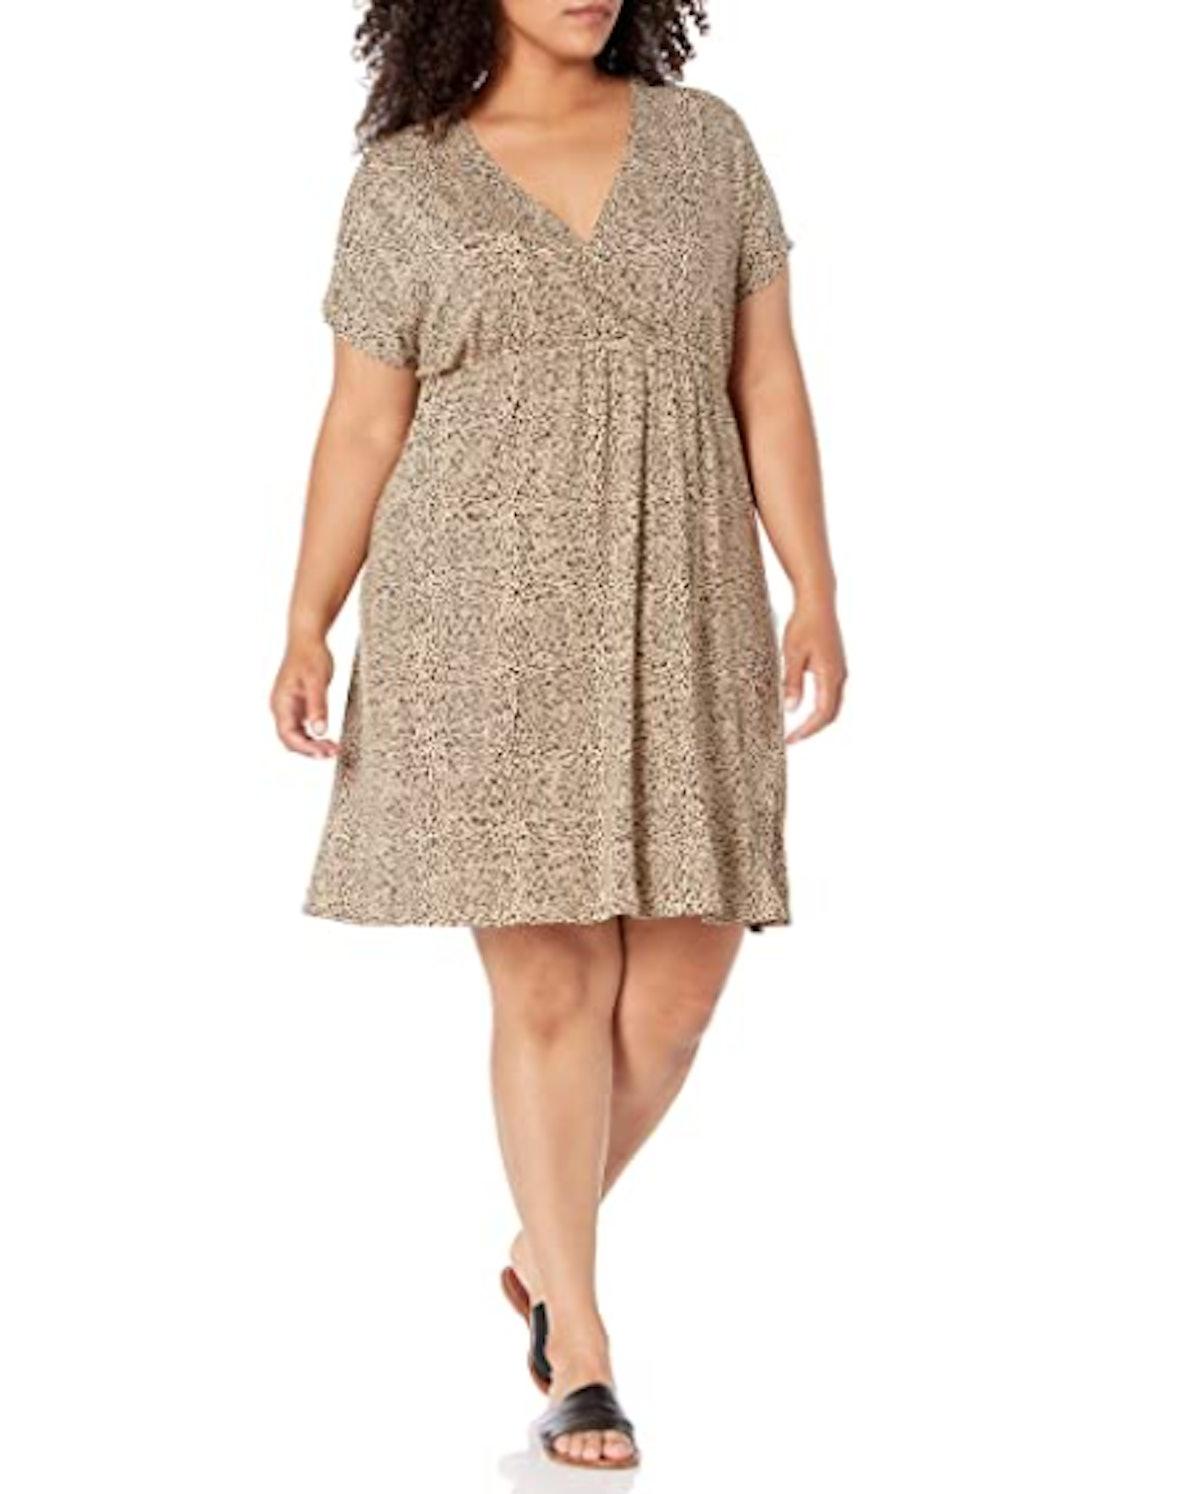 Amazon Essentials Women's Plus Size Surplice Dress